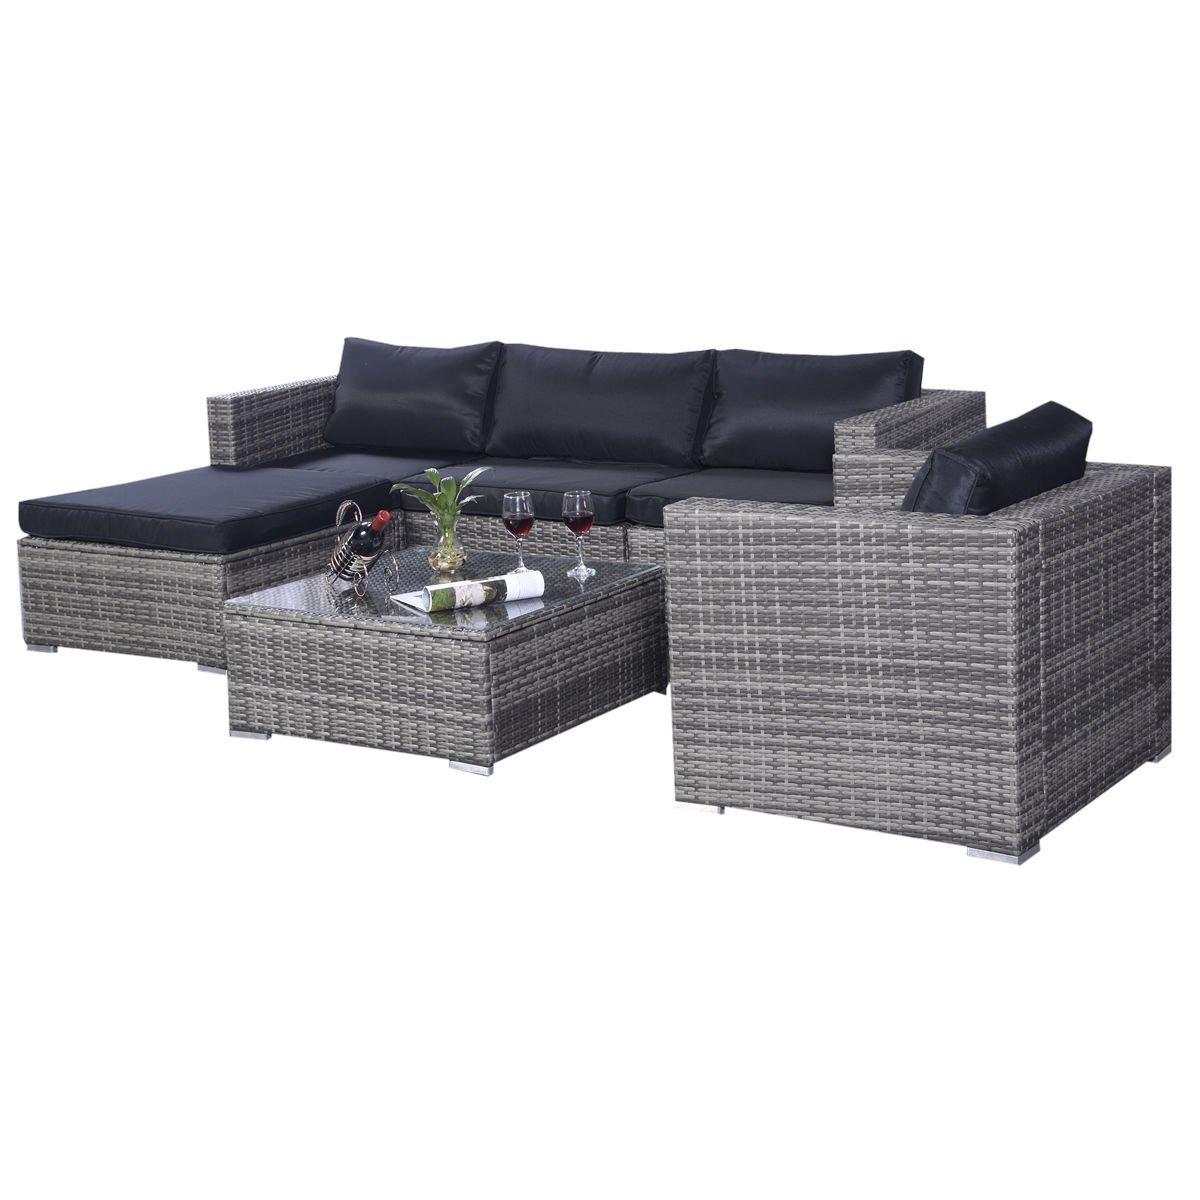 Amazon.com : Tangkula 6PC Furniture Set Aluminum Patio Sofa PE Gray Rattan  Couch 2 Set Cushion Covers : Garden U0026 Outdoor